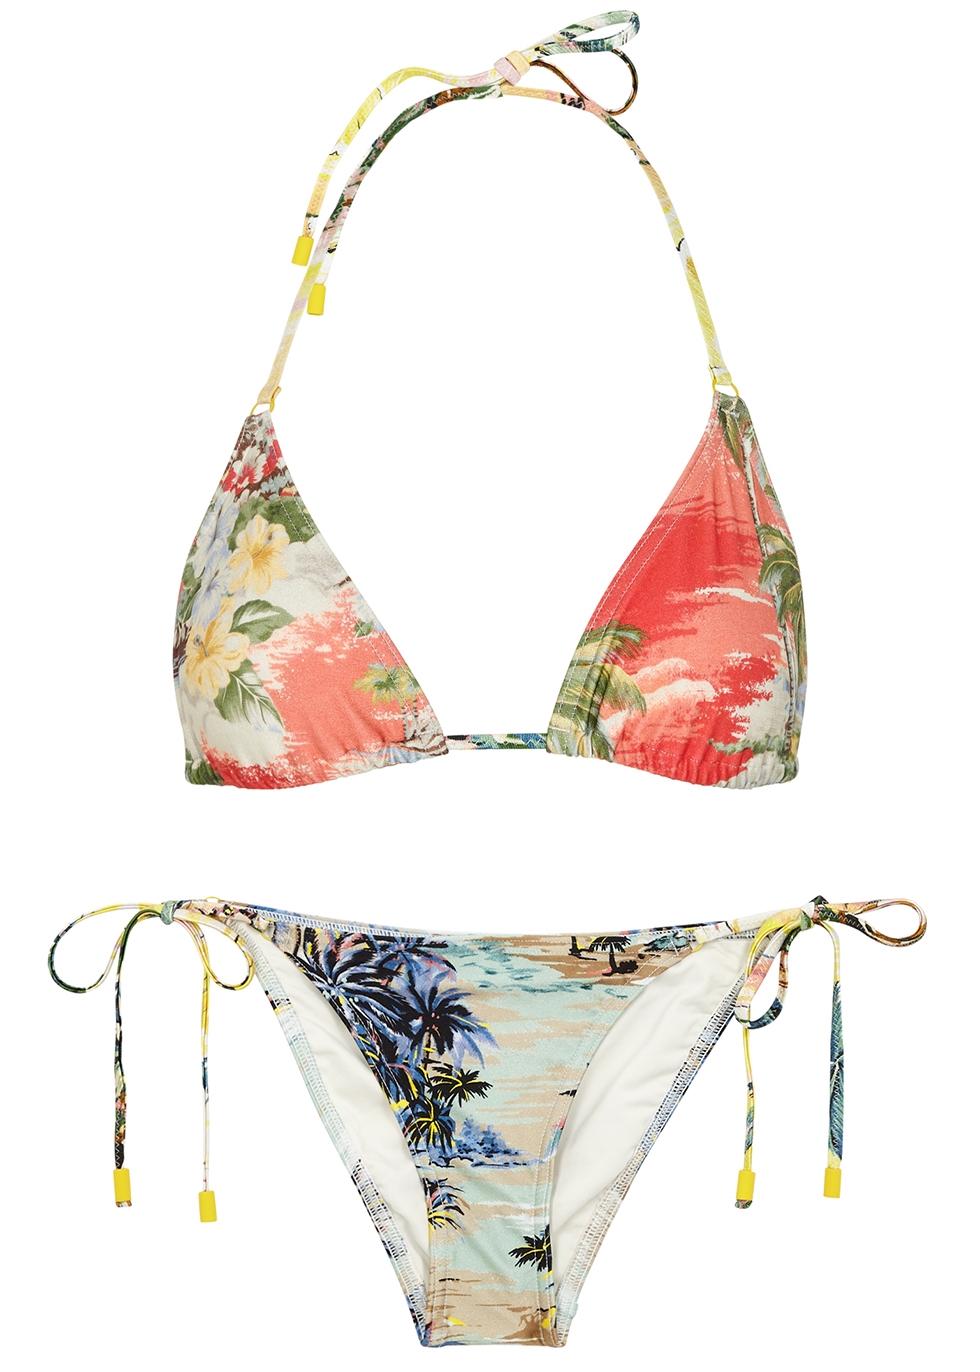 Juliette Spliced printed triangle bikini